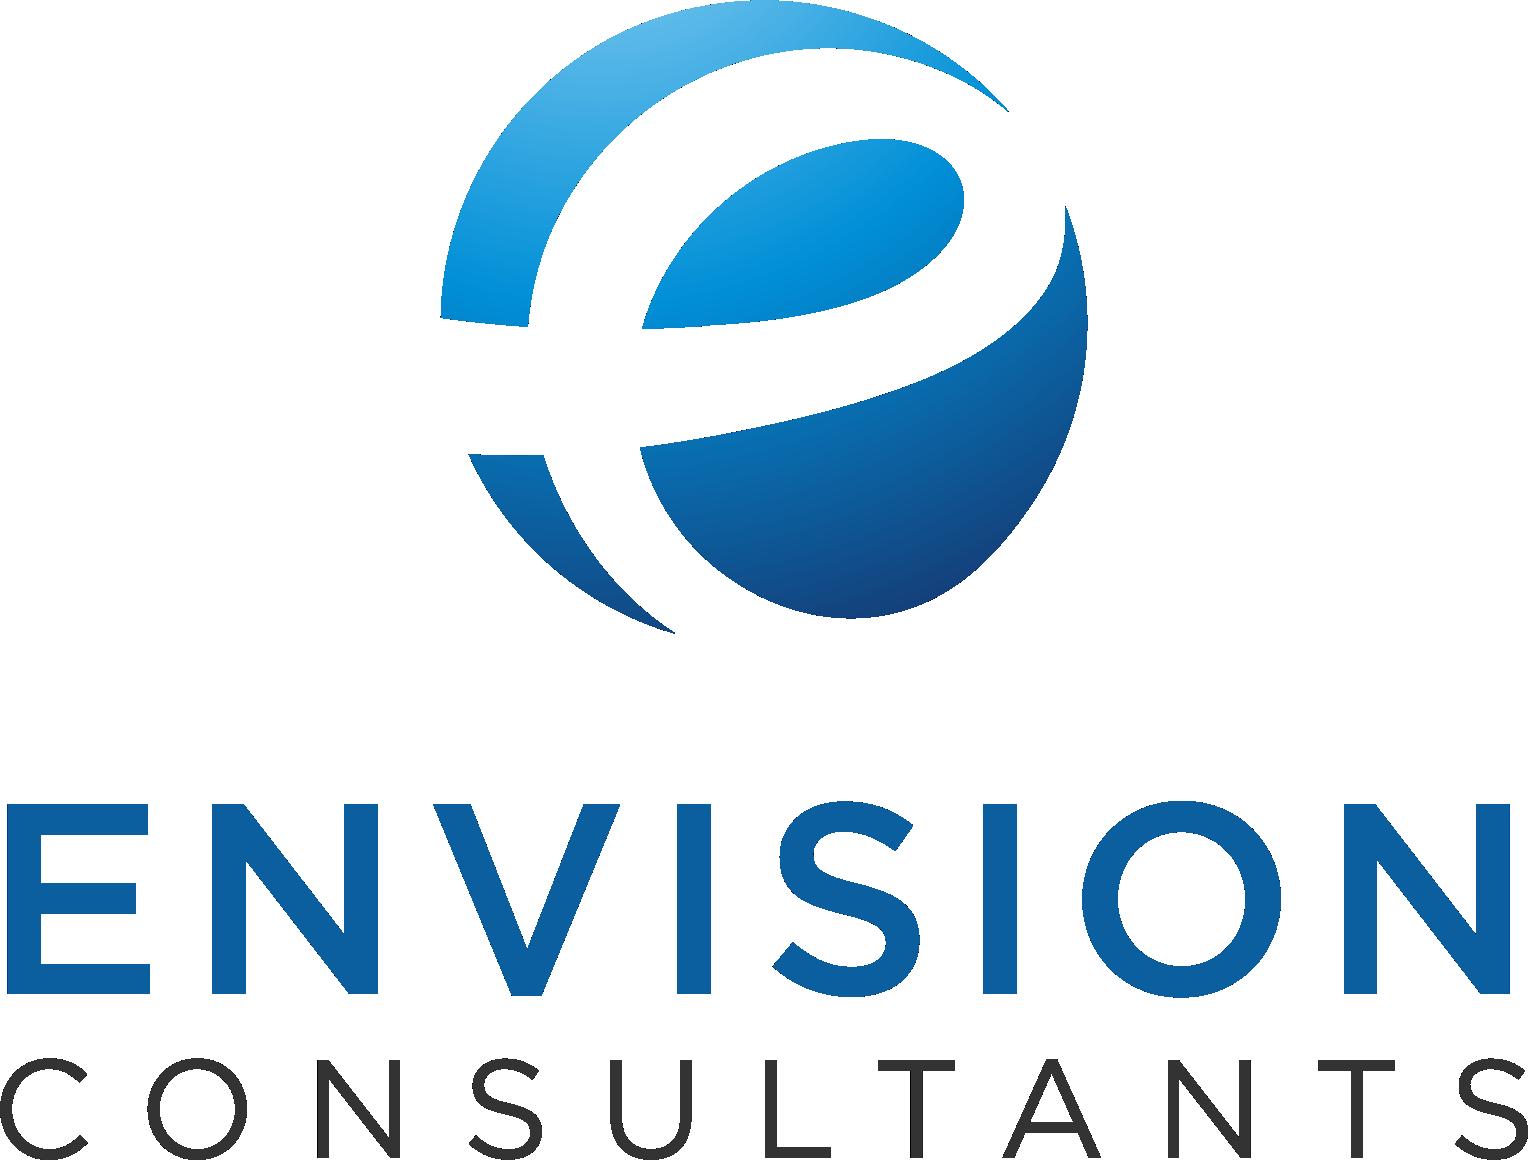 Biotech consulting company needs logo